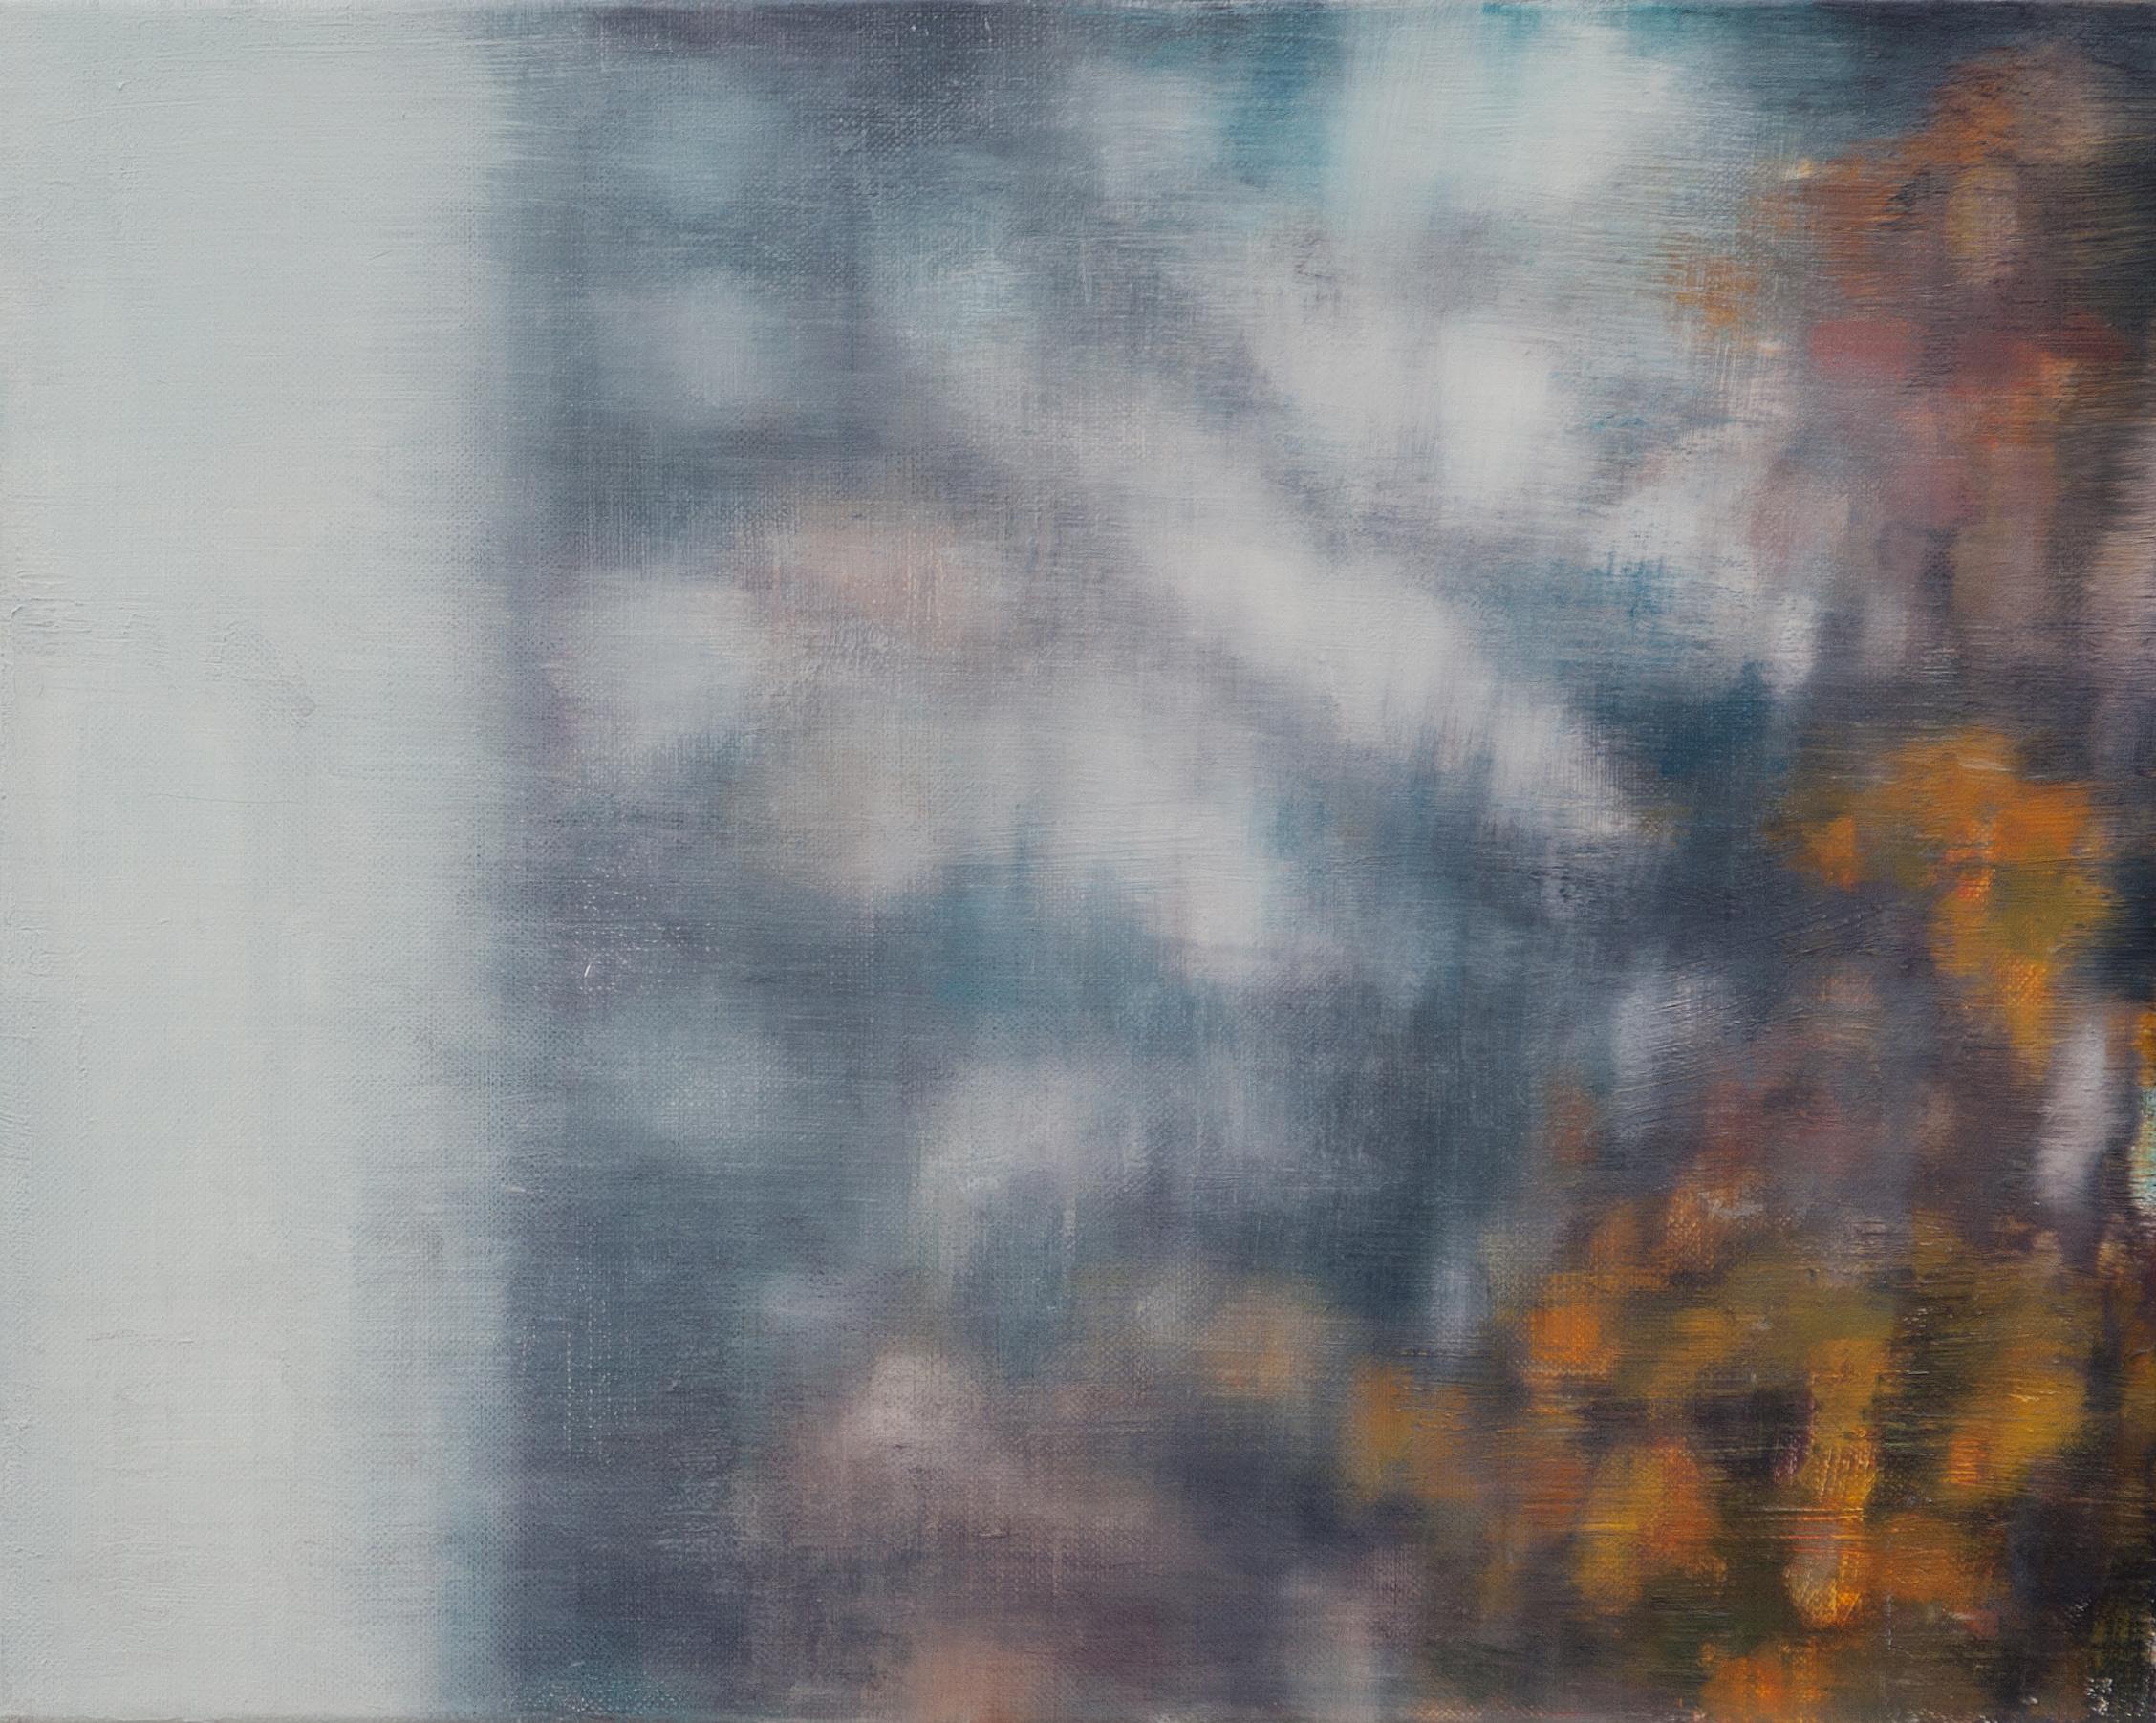 Joanna Logue, Essington - Window II , 2015, oil on linen on board, 40 x 50cm